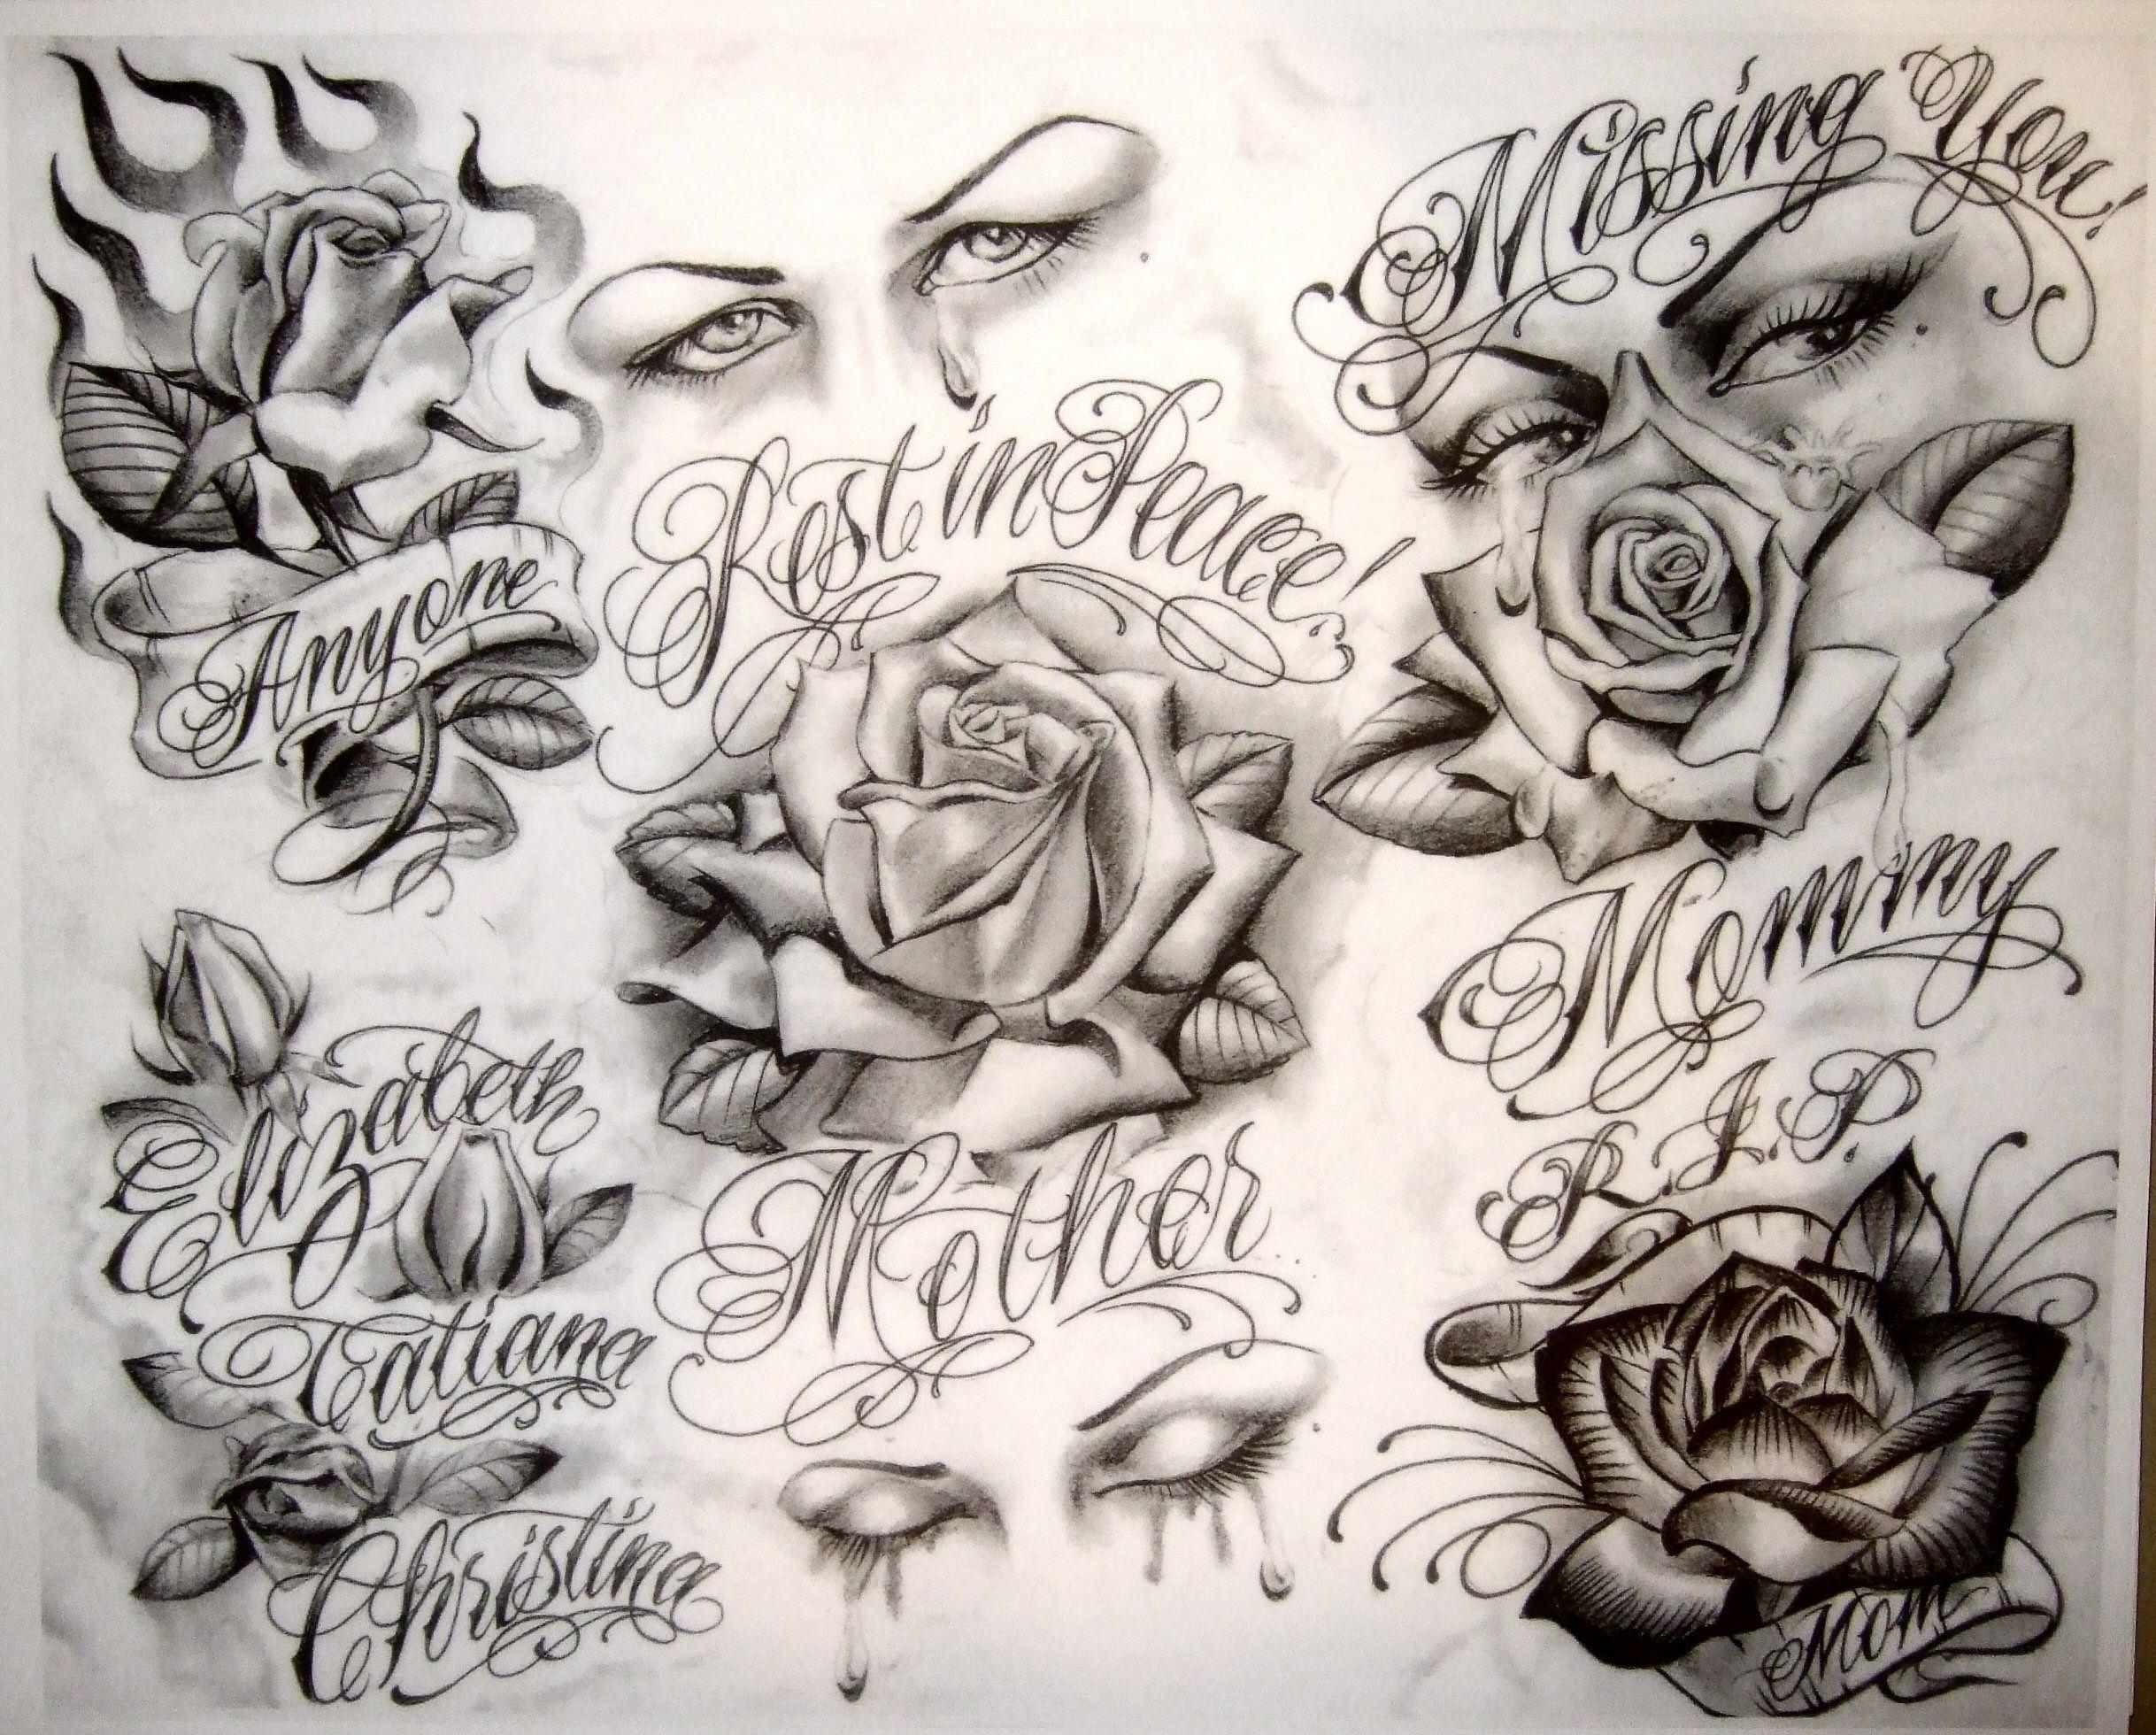 Pin by melinda mascarenas on tattoos boog tattoo